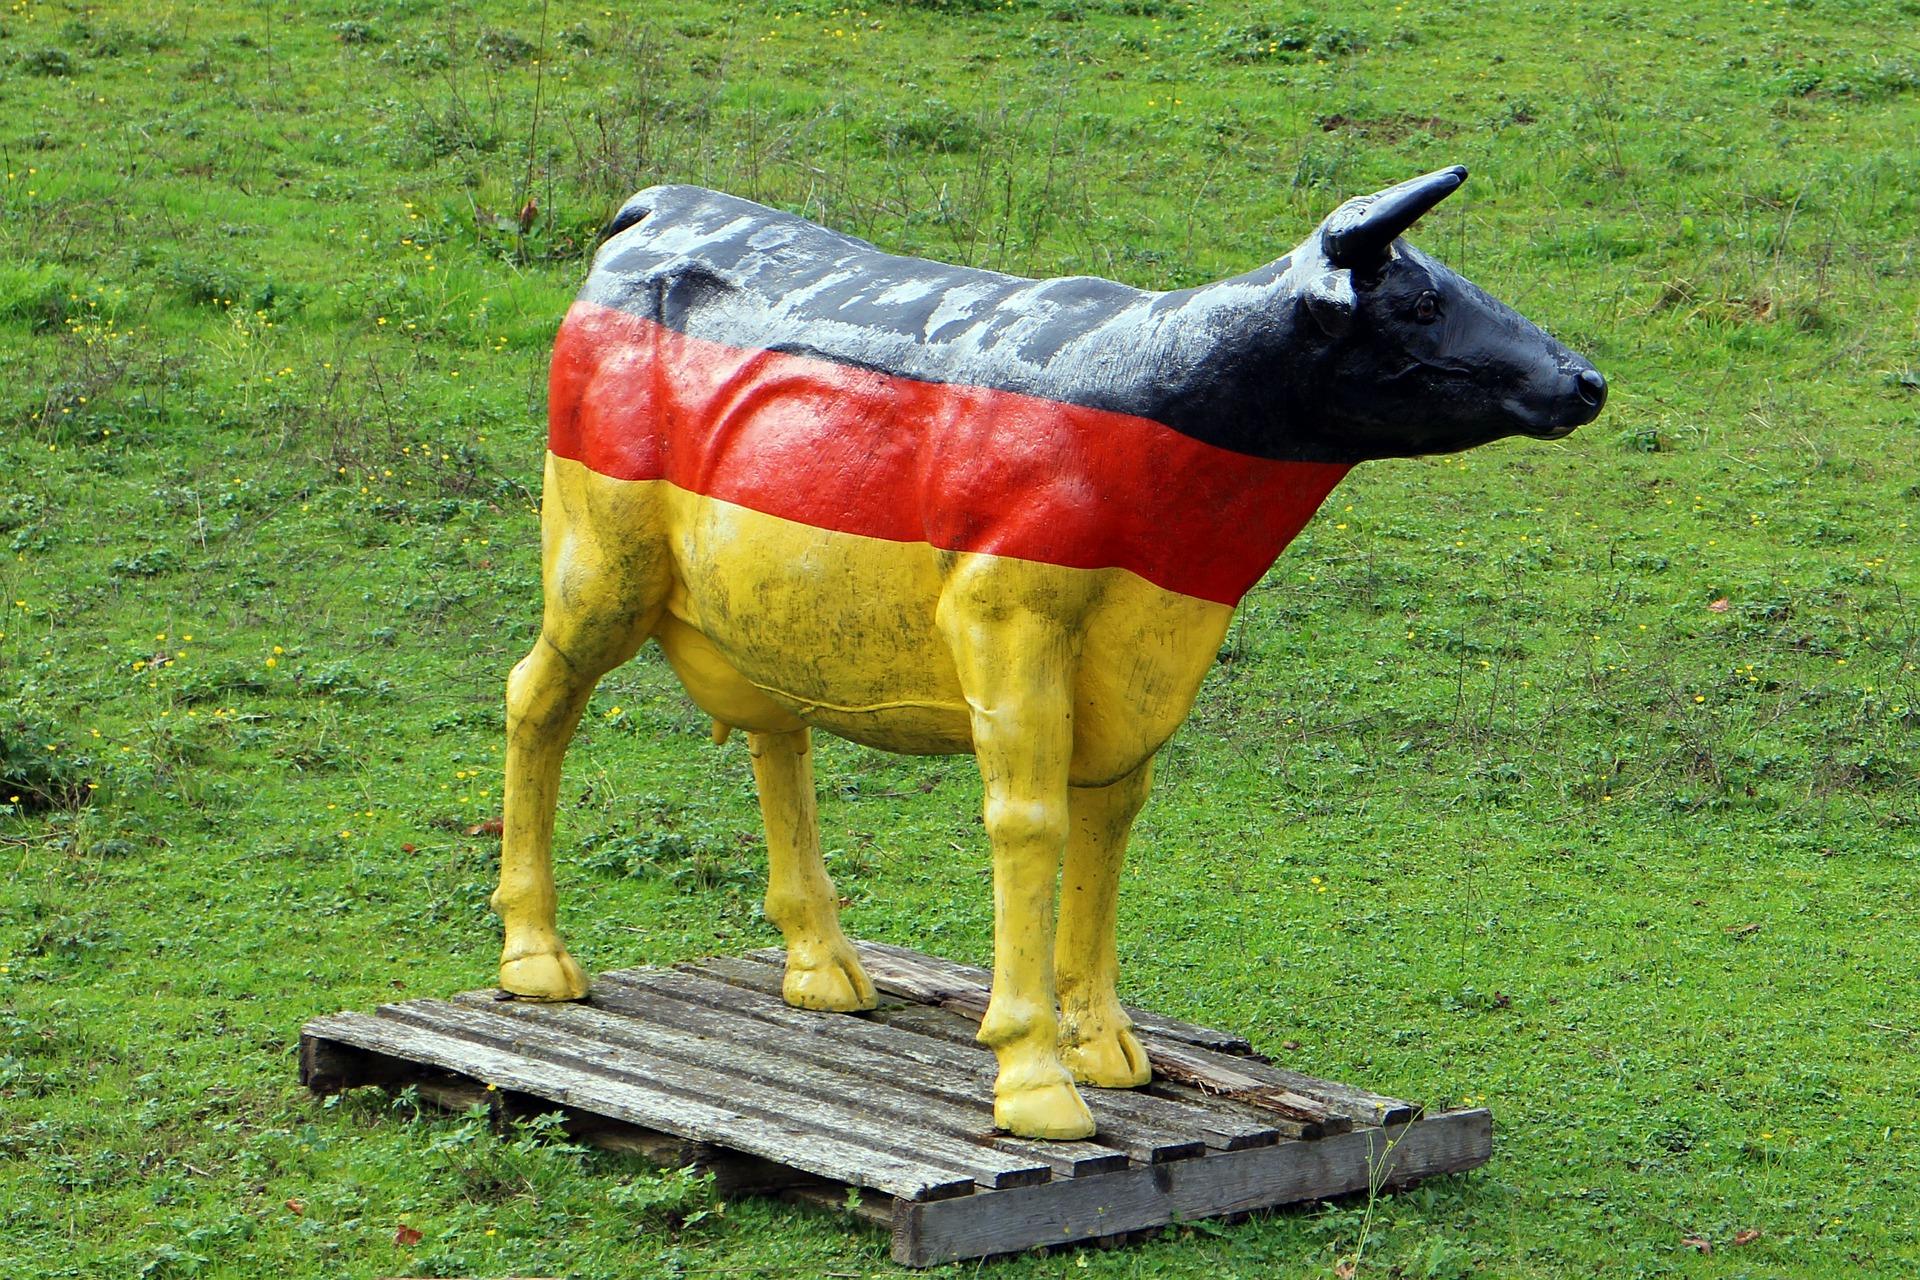 cow-491264_1920.jpg